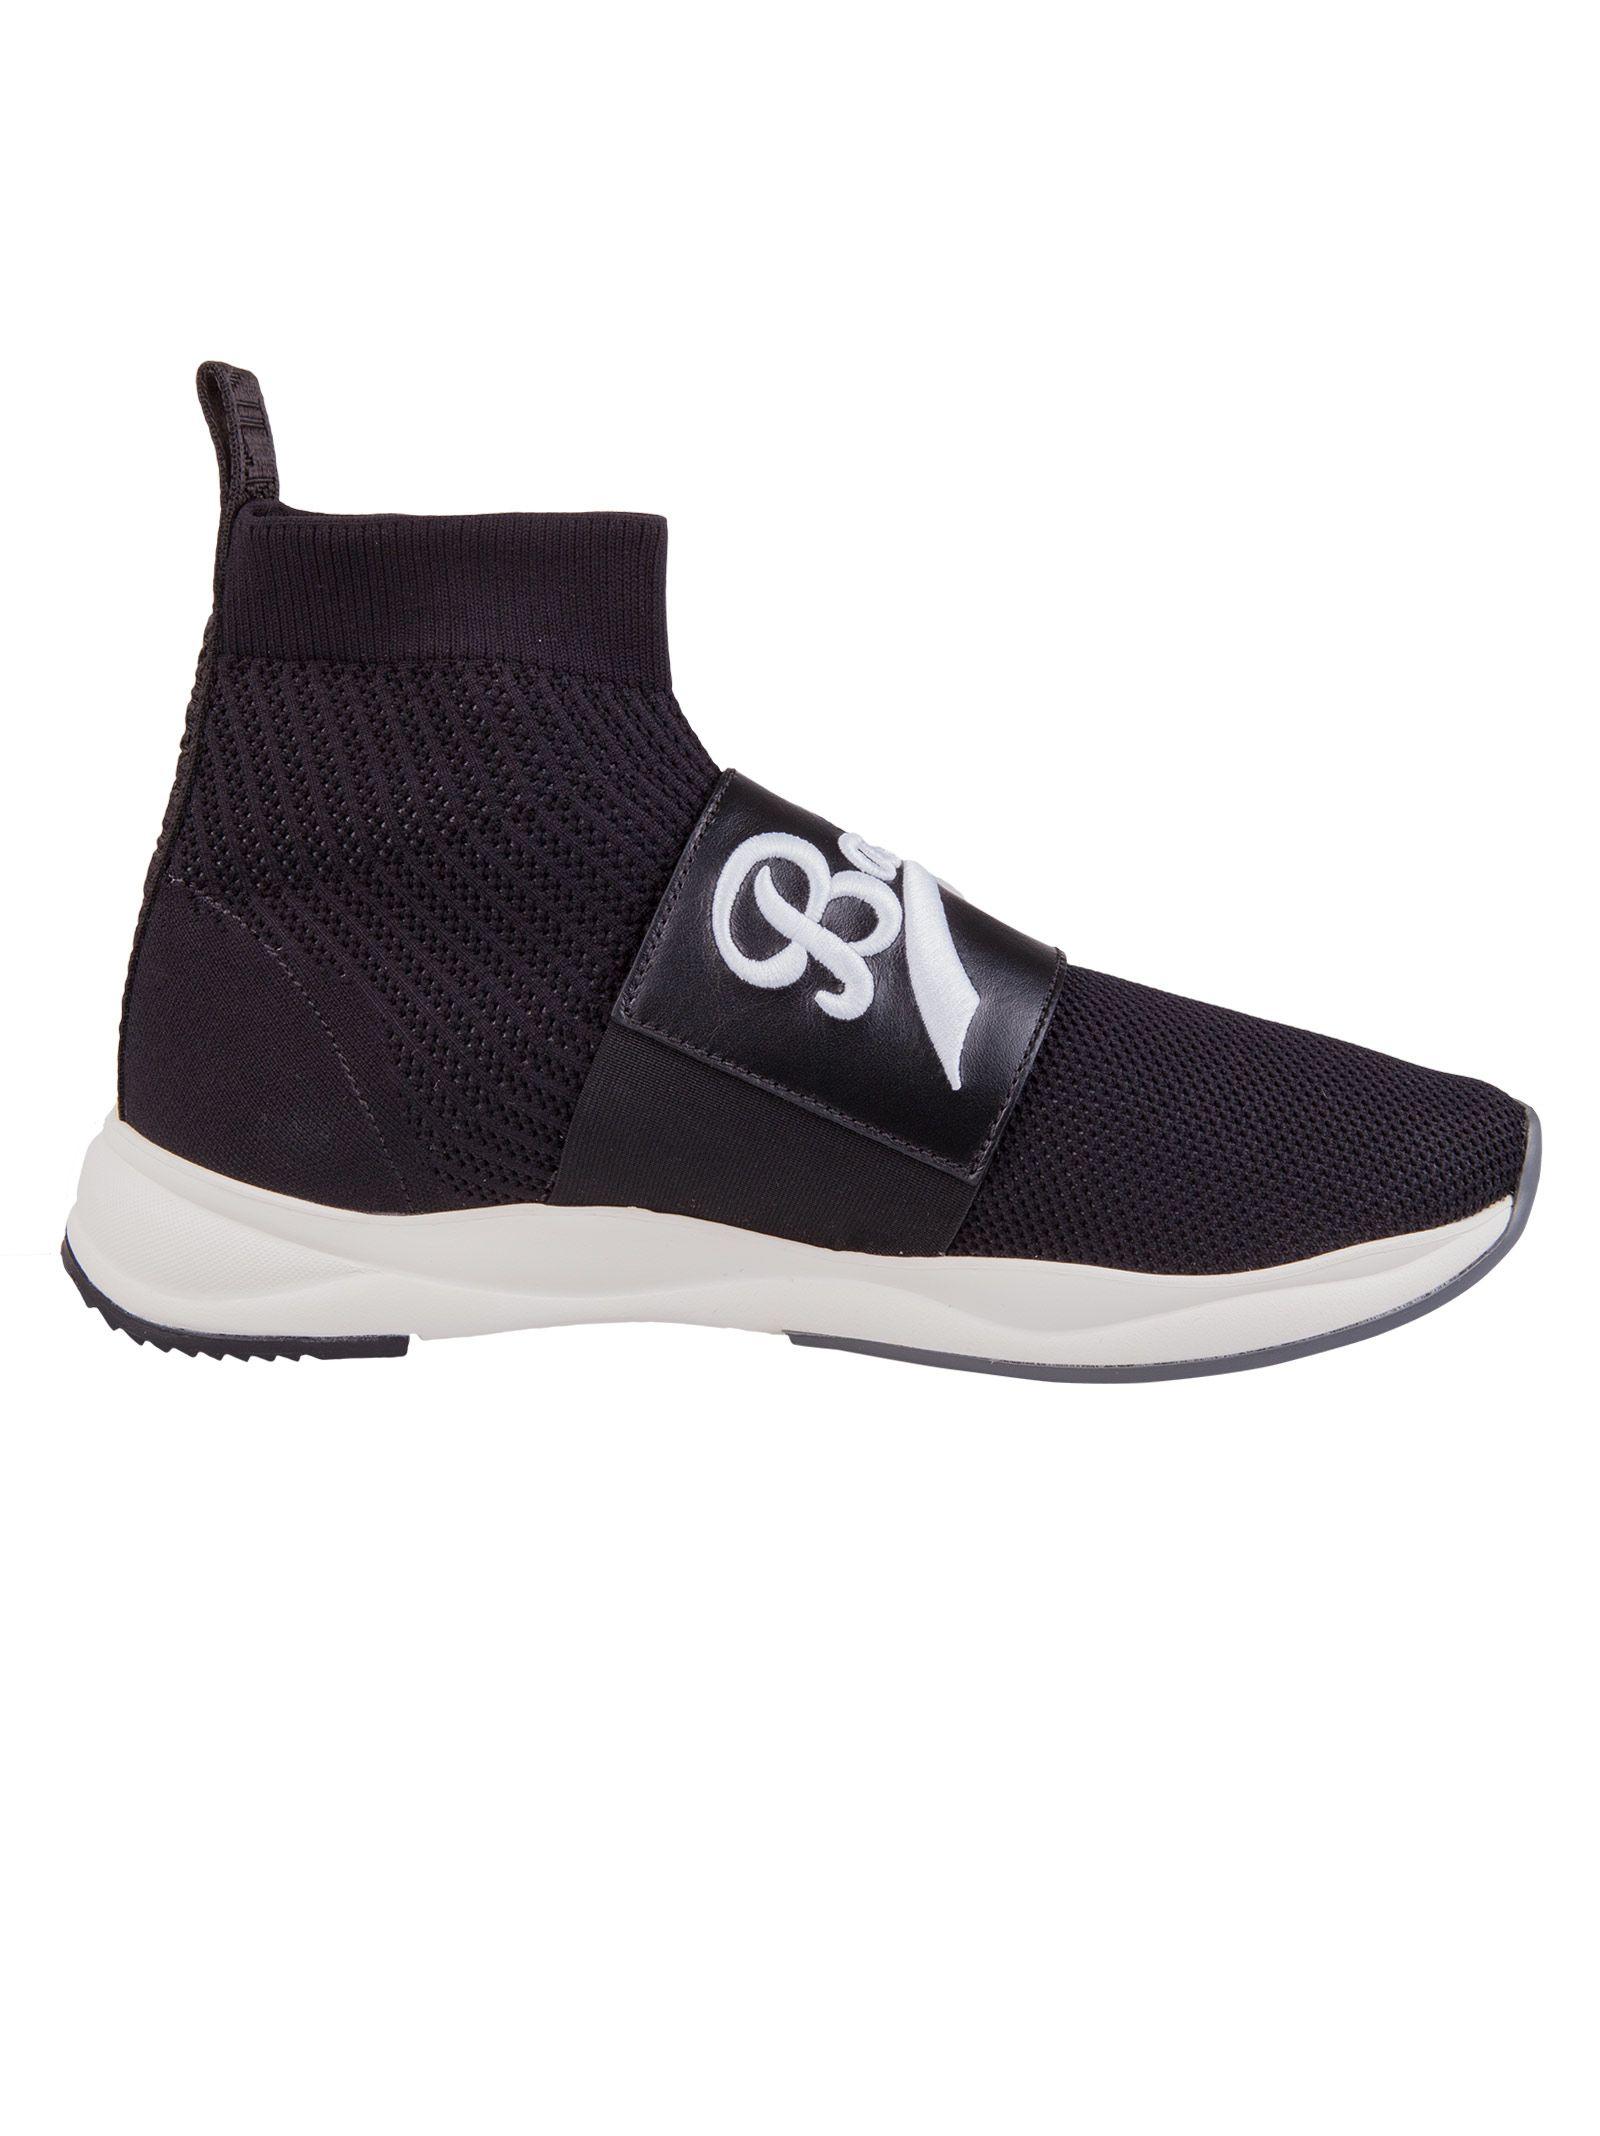 00db7d8f423 Balmain Paris Shoes In Nero | ModeSens